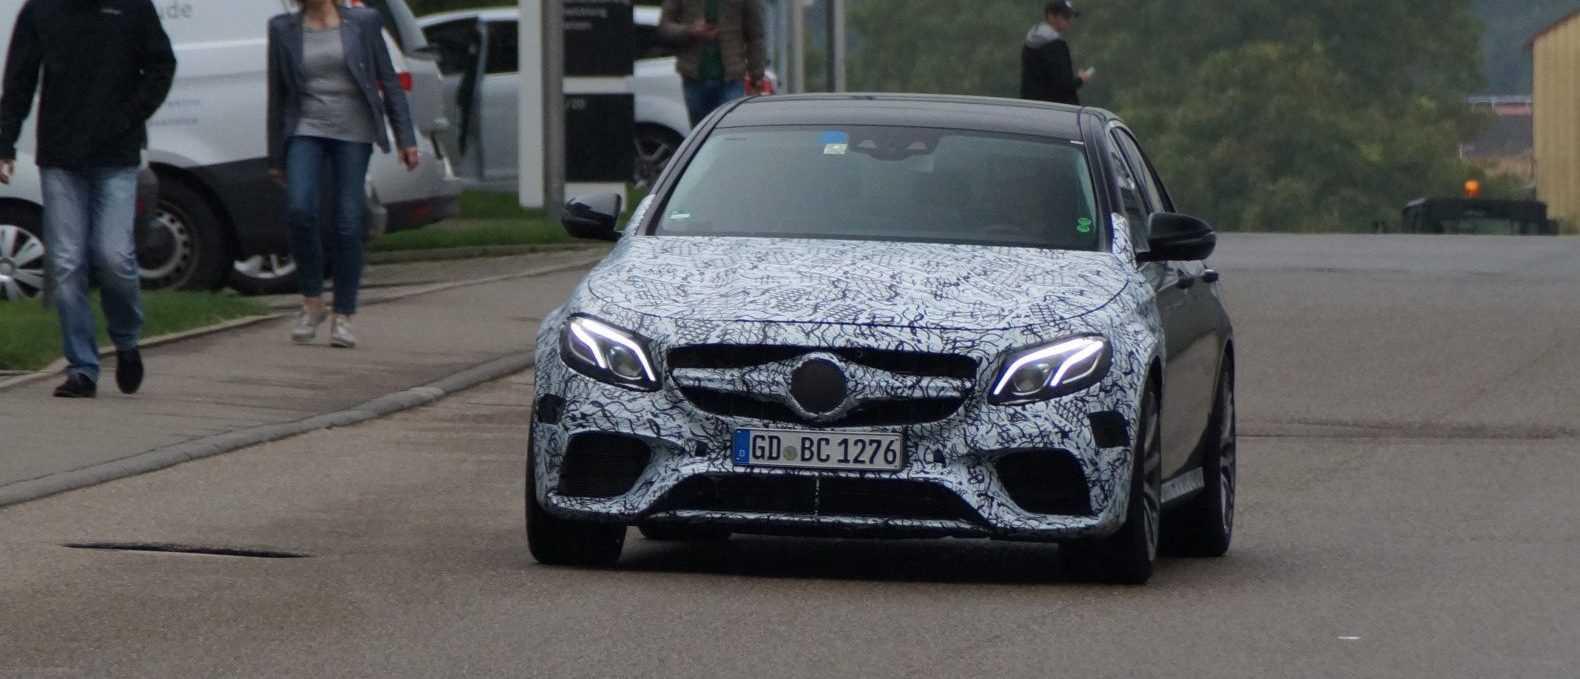 Mercedes-AMG E 63 Limousine 2017